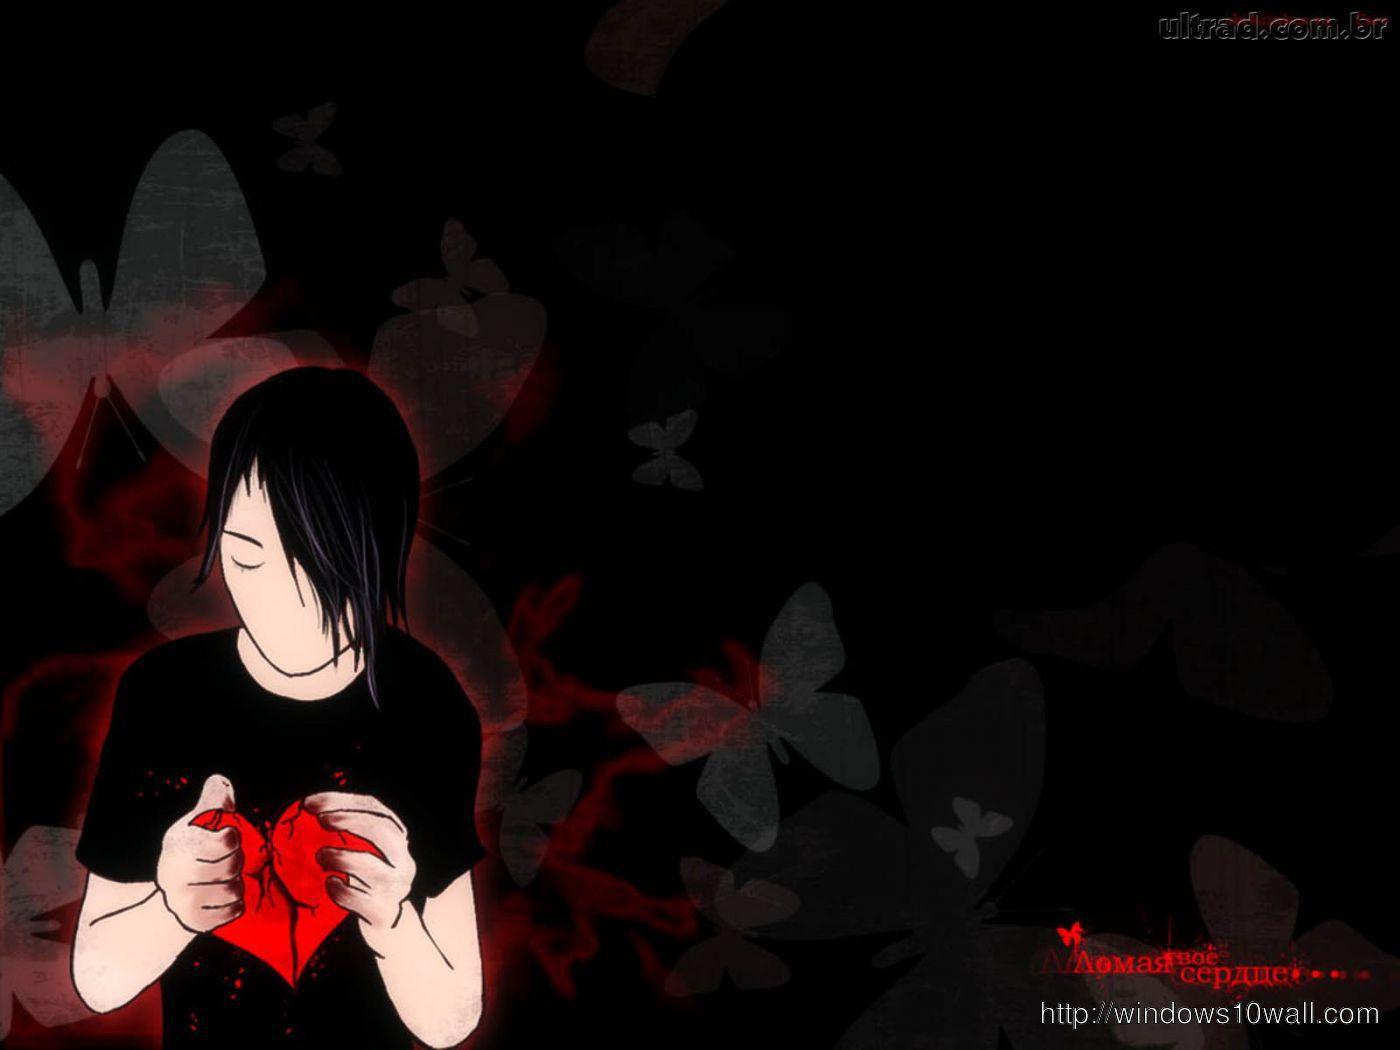 Sweet Sad Girl Hd Wallpaper Broken Heart Dark Background Windows 10 Wallpapers